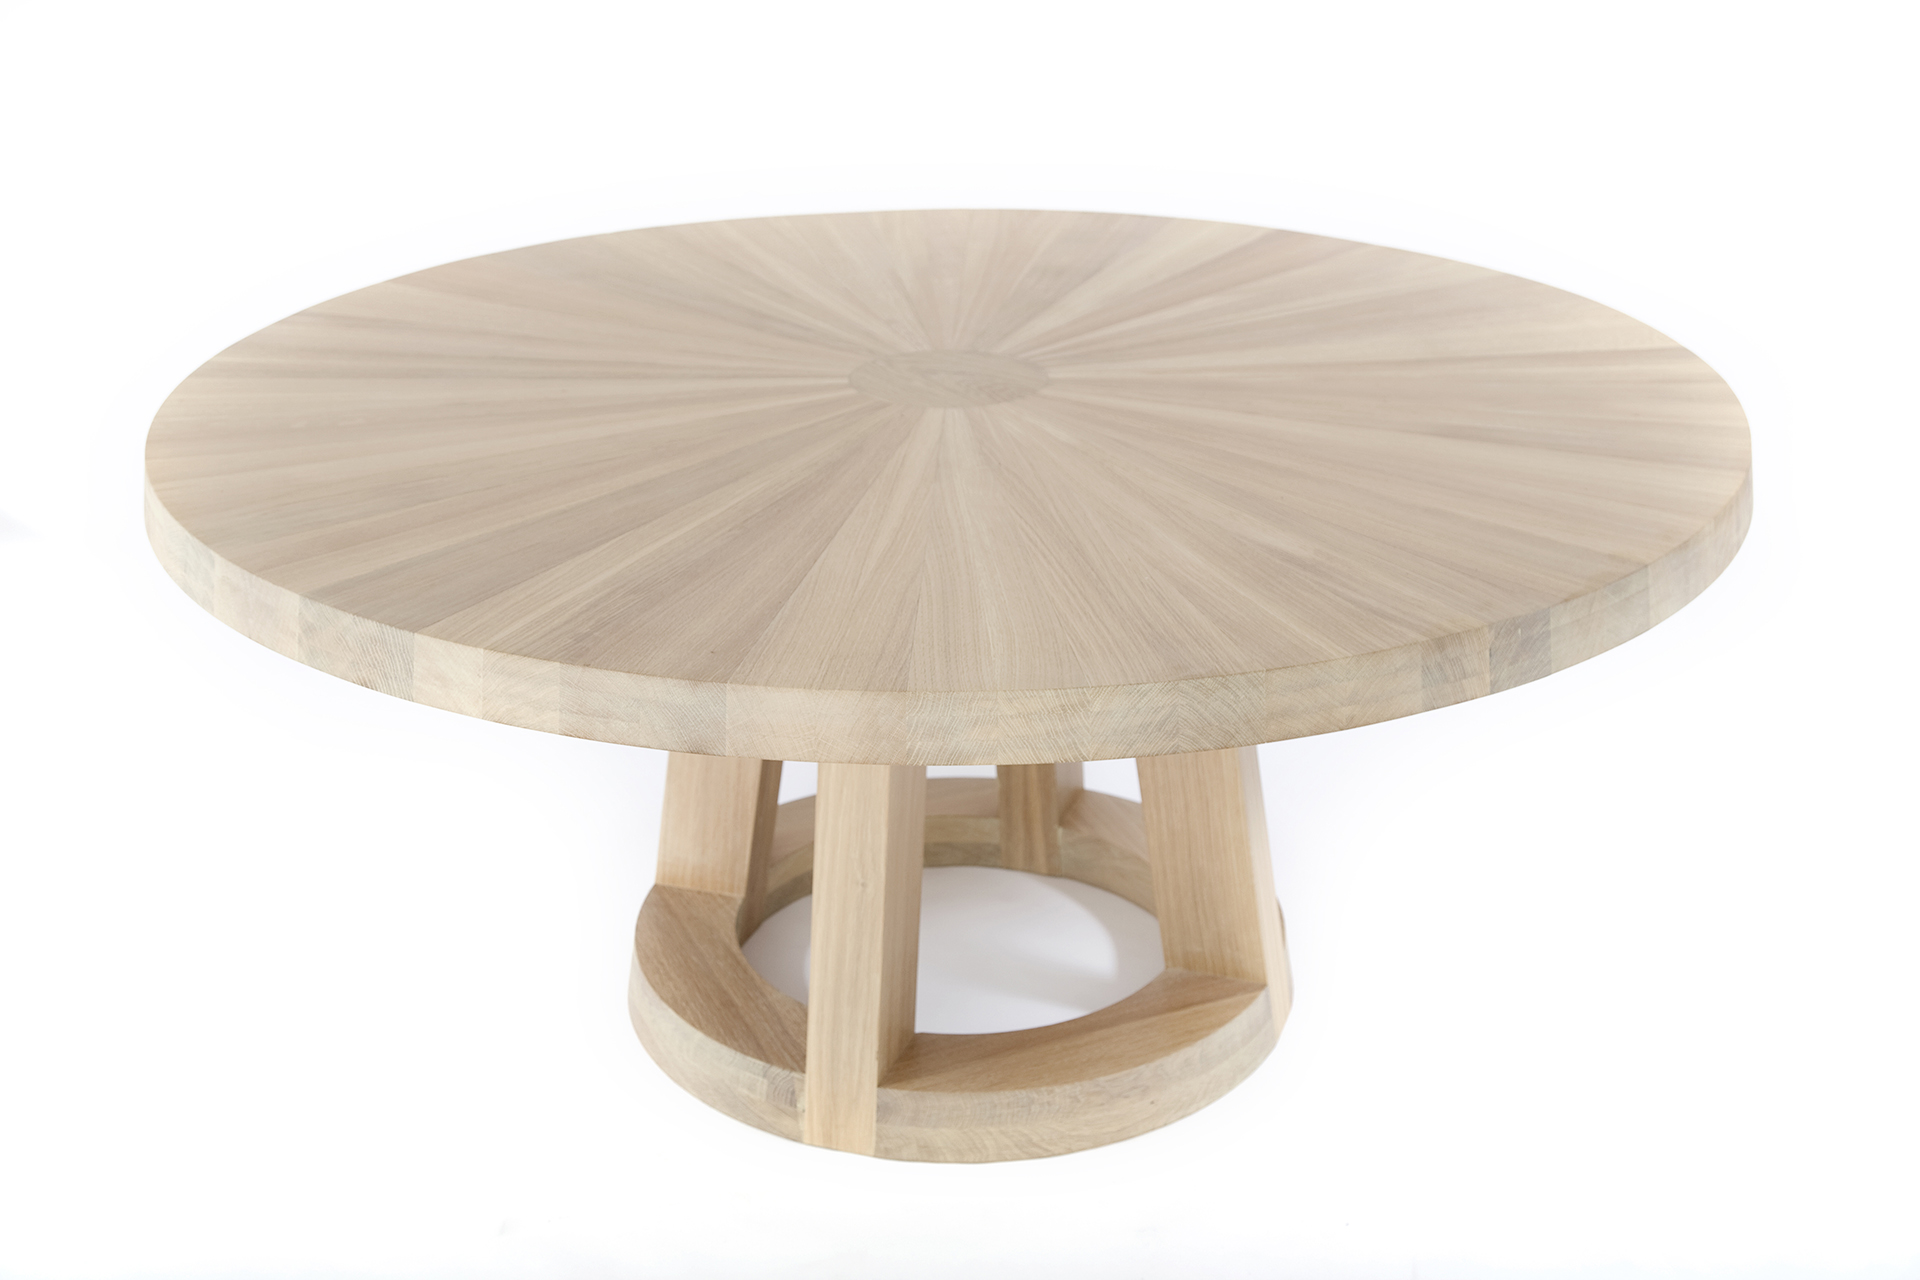 Solid ronde design tafel l remy meijers l odesi. your dutch design.